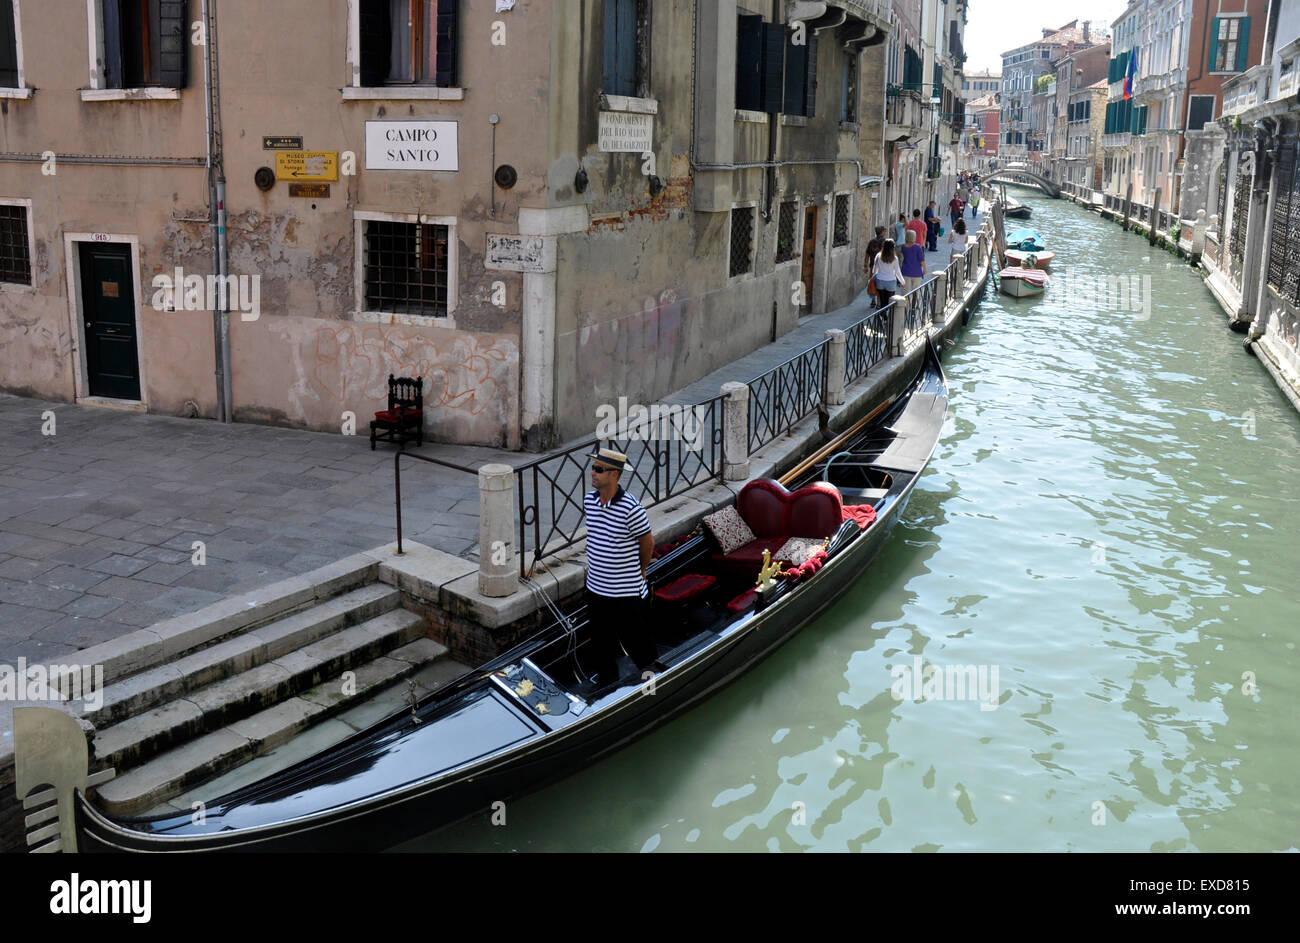 Italy Venice Cannaregio region canal at Campo Santo off Strada Nova - gondolier touting for tourists - sunlight - Stock Image